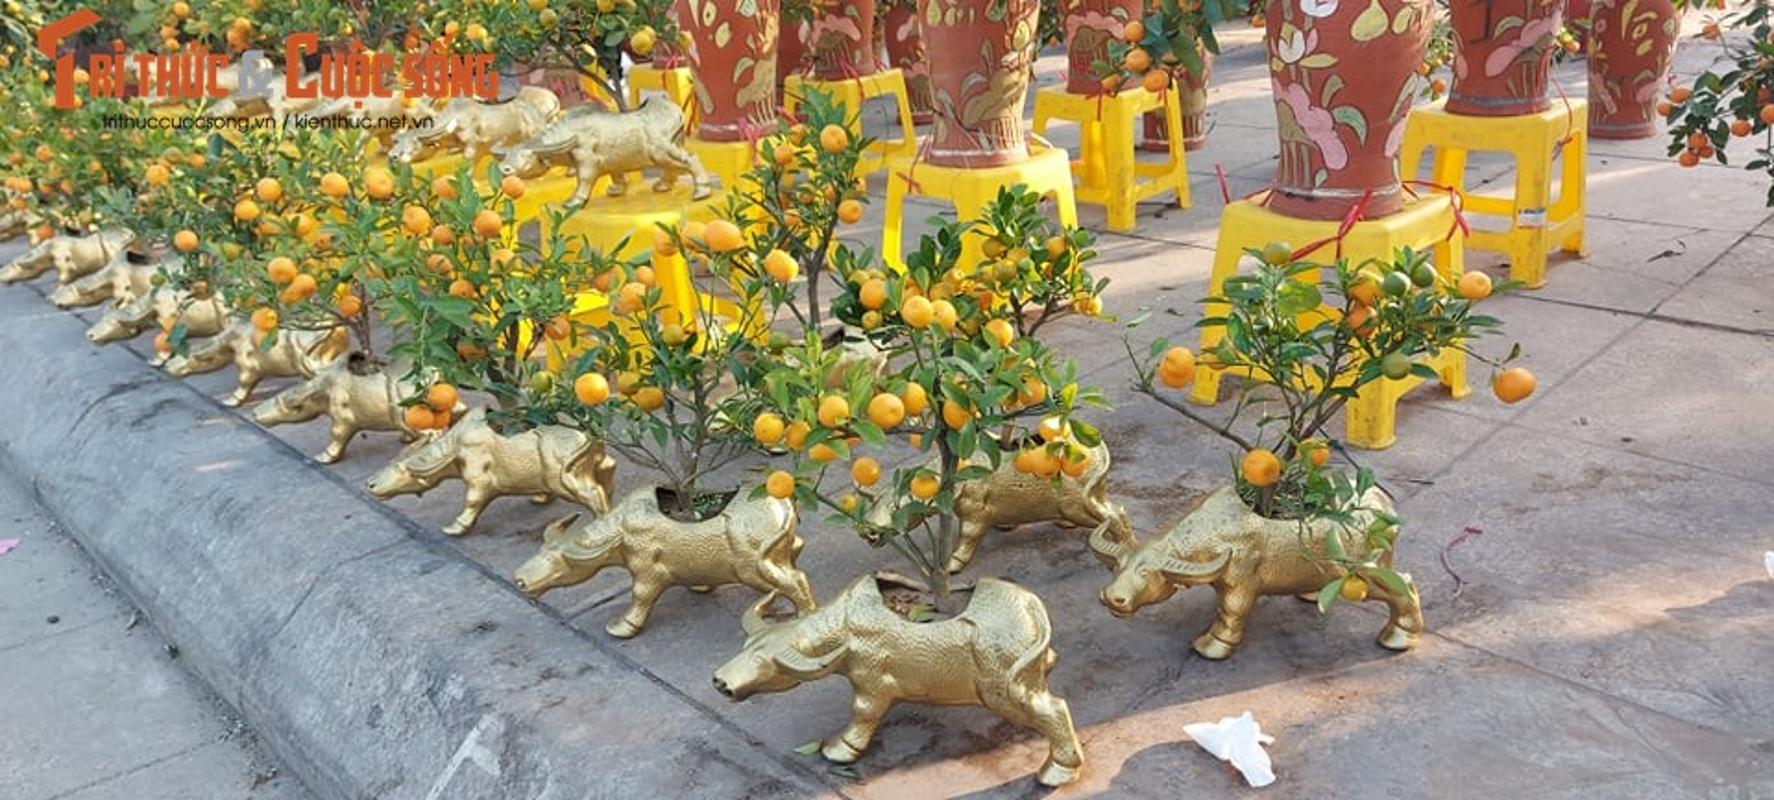 Nguoi dan Quang Ninh ngam hoa Xuan, tam quen met moi vi COVID-19-Hinh-10